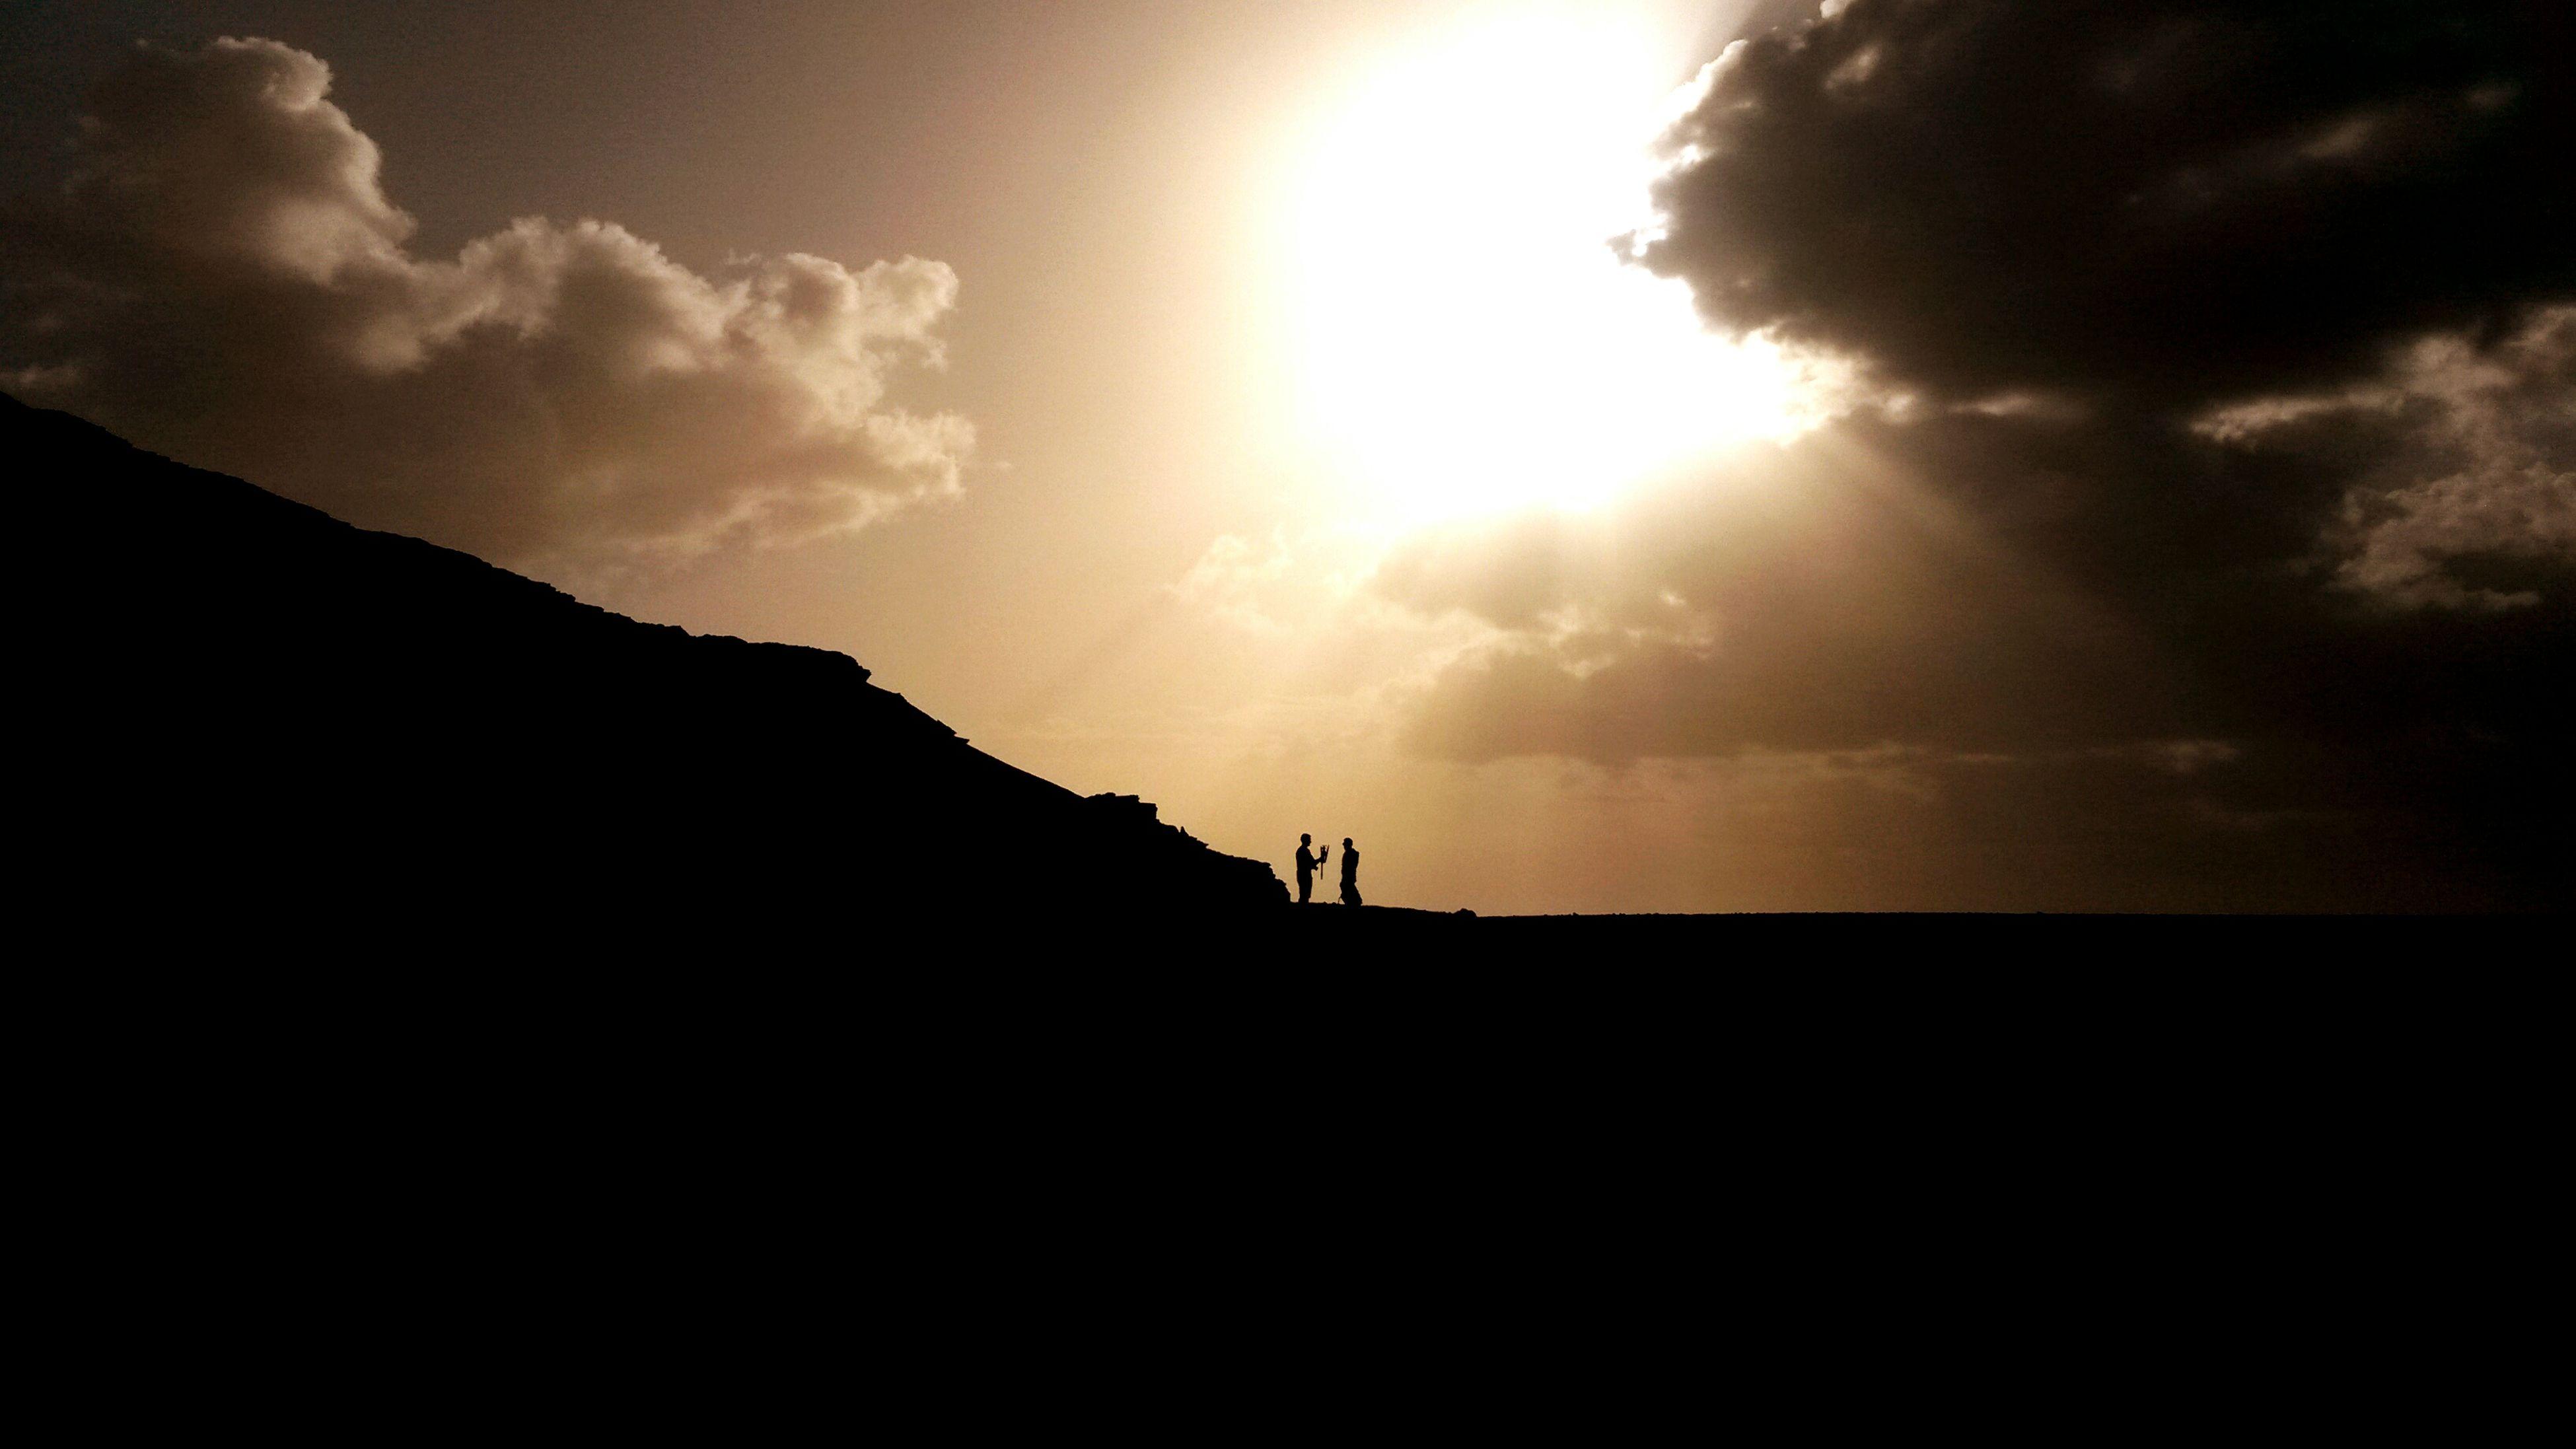 sun, silhouette, sunbeam, sky, sunlight, mountain, scenics, tranquil scene, tranquility, beauty in nature, lens flare, cloud - sky, nature, cloud, sea, idyllic, sunset, mountain range, bright, outdoors